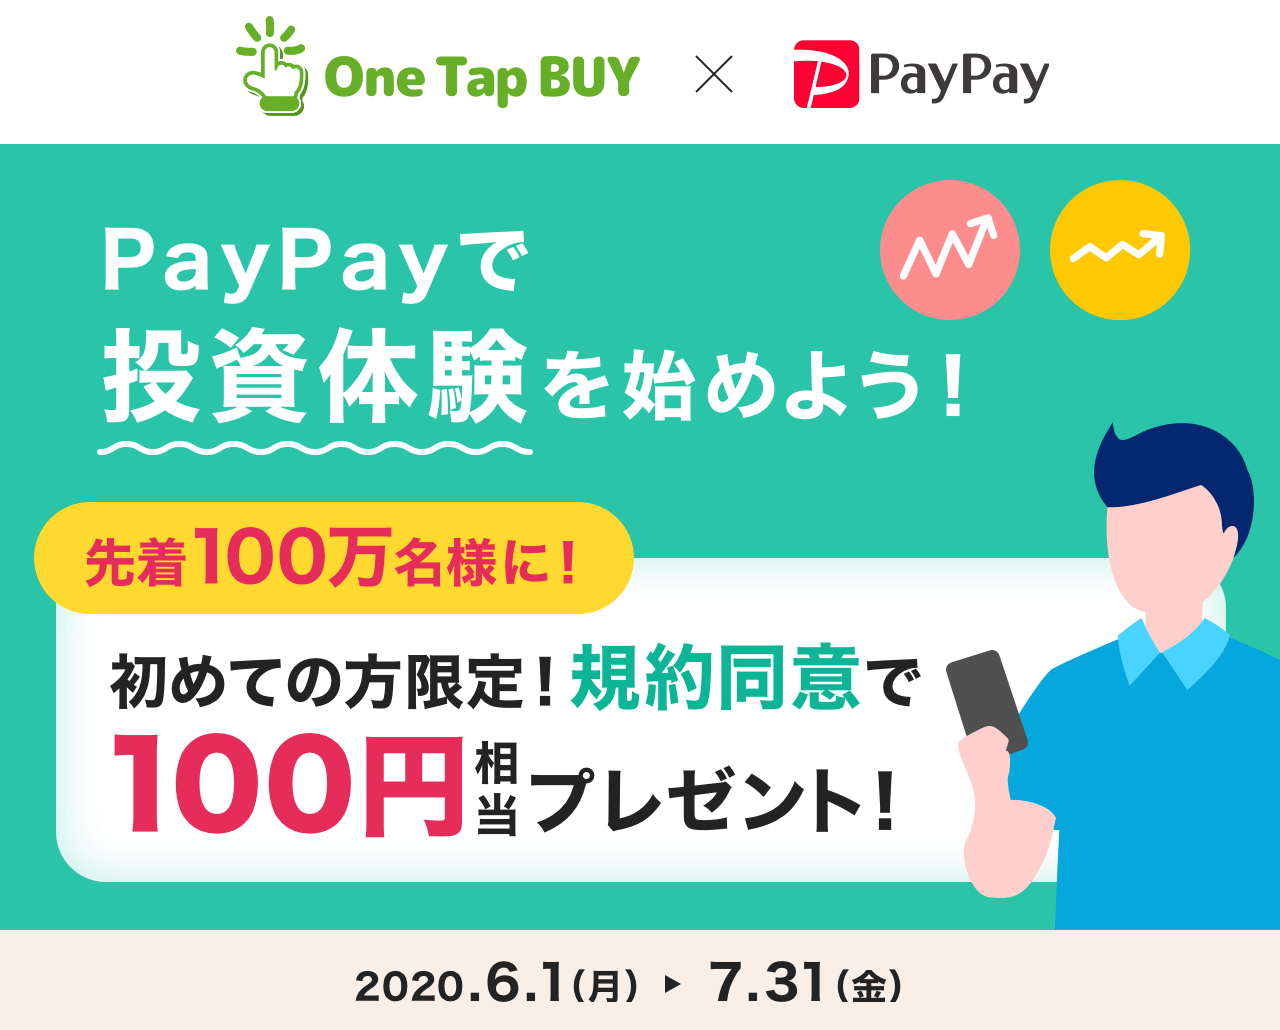 PayPayで投資体験を始めよう!先着100万名様に!初めての方限定!規約同意で100円相当プレゼント!